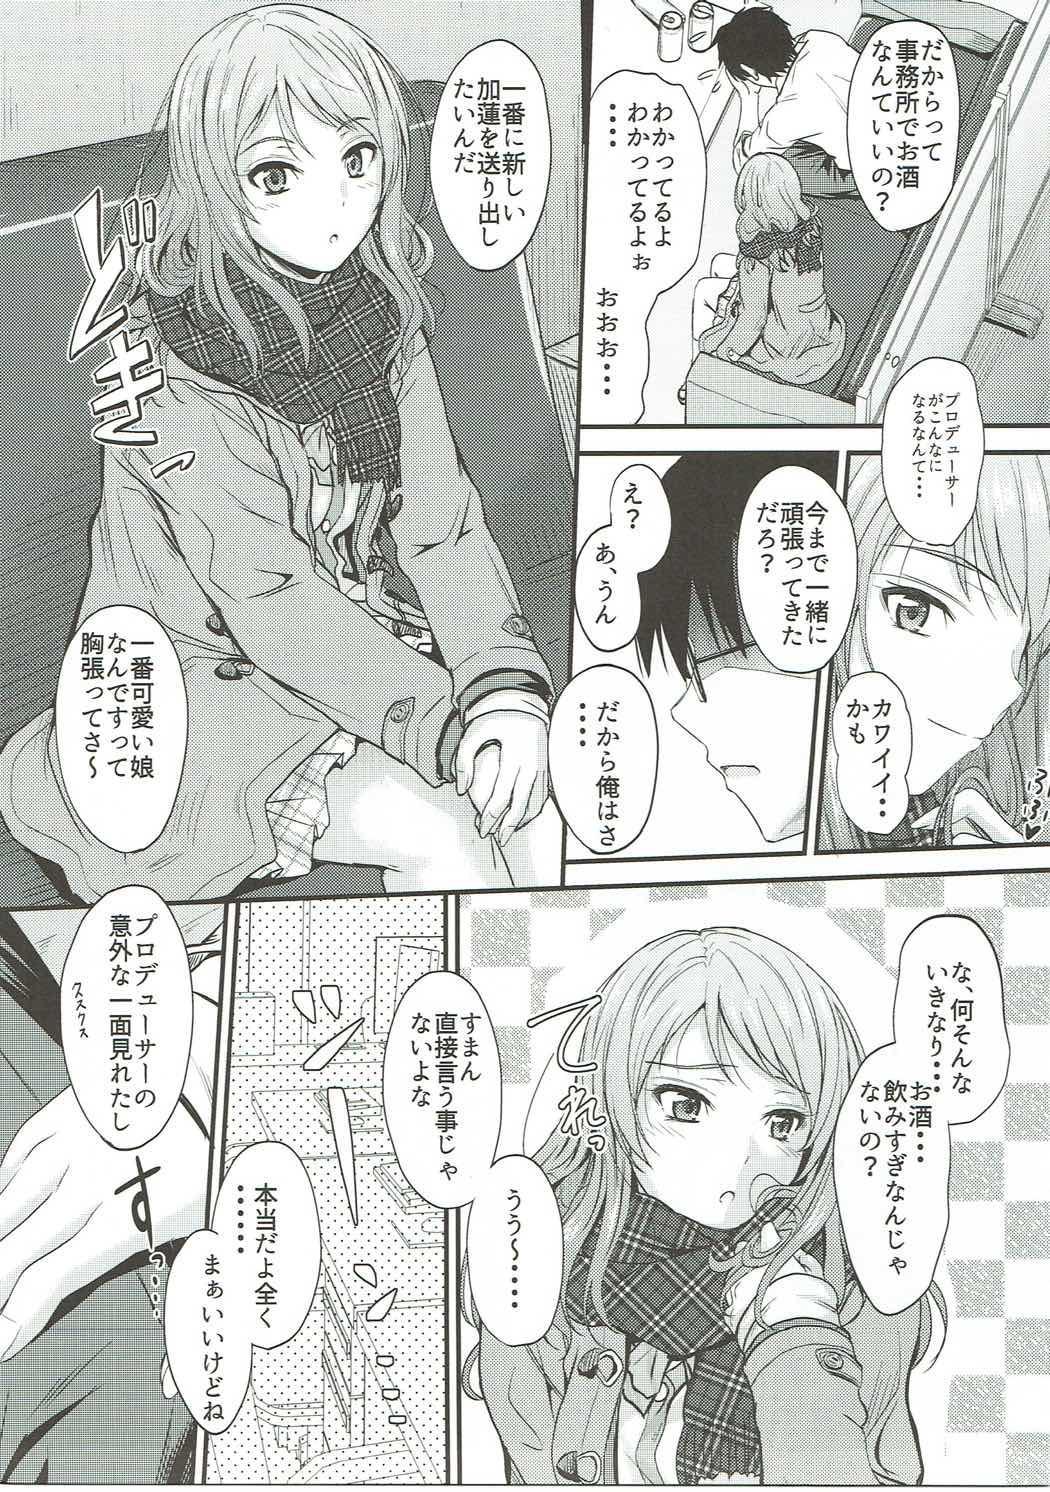 Koiiro Karen 2 5